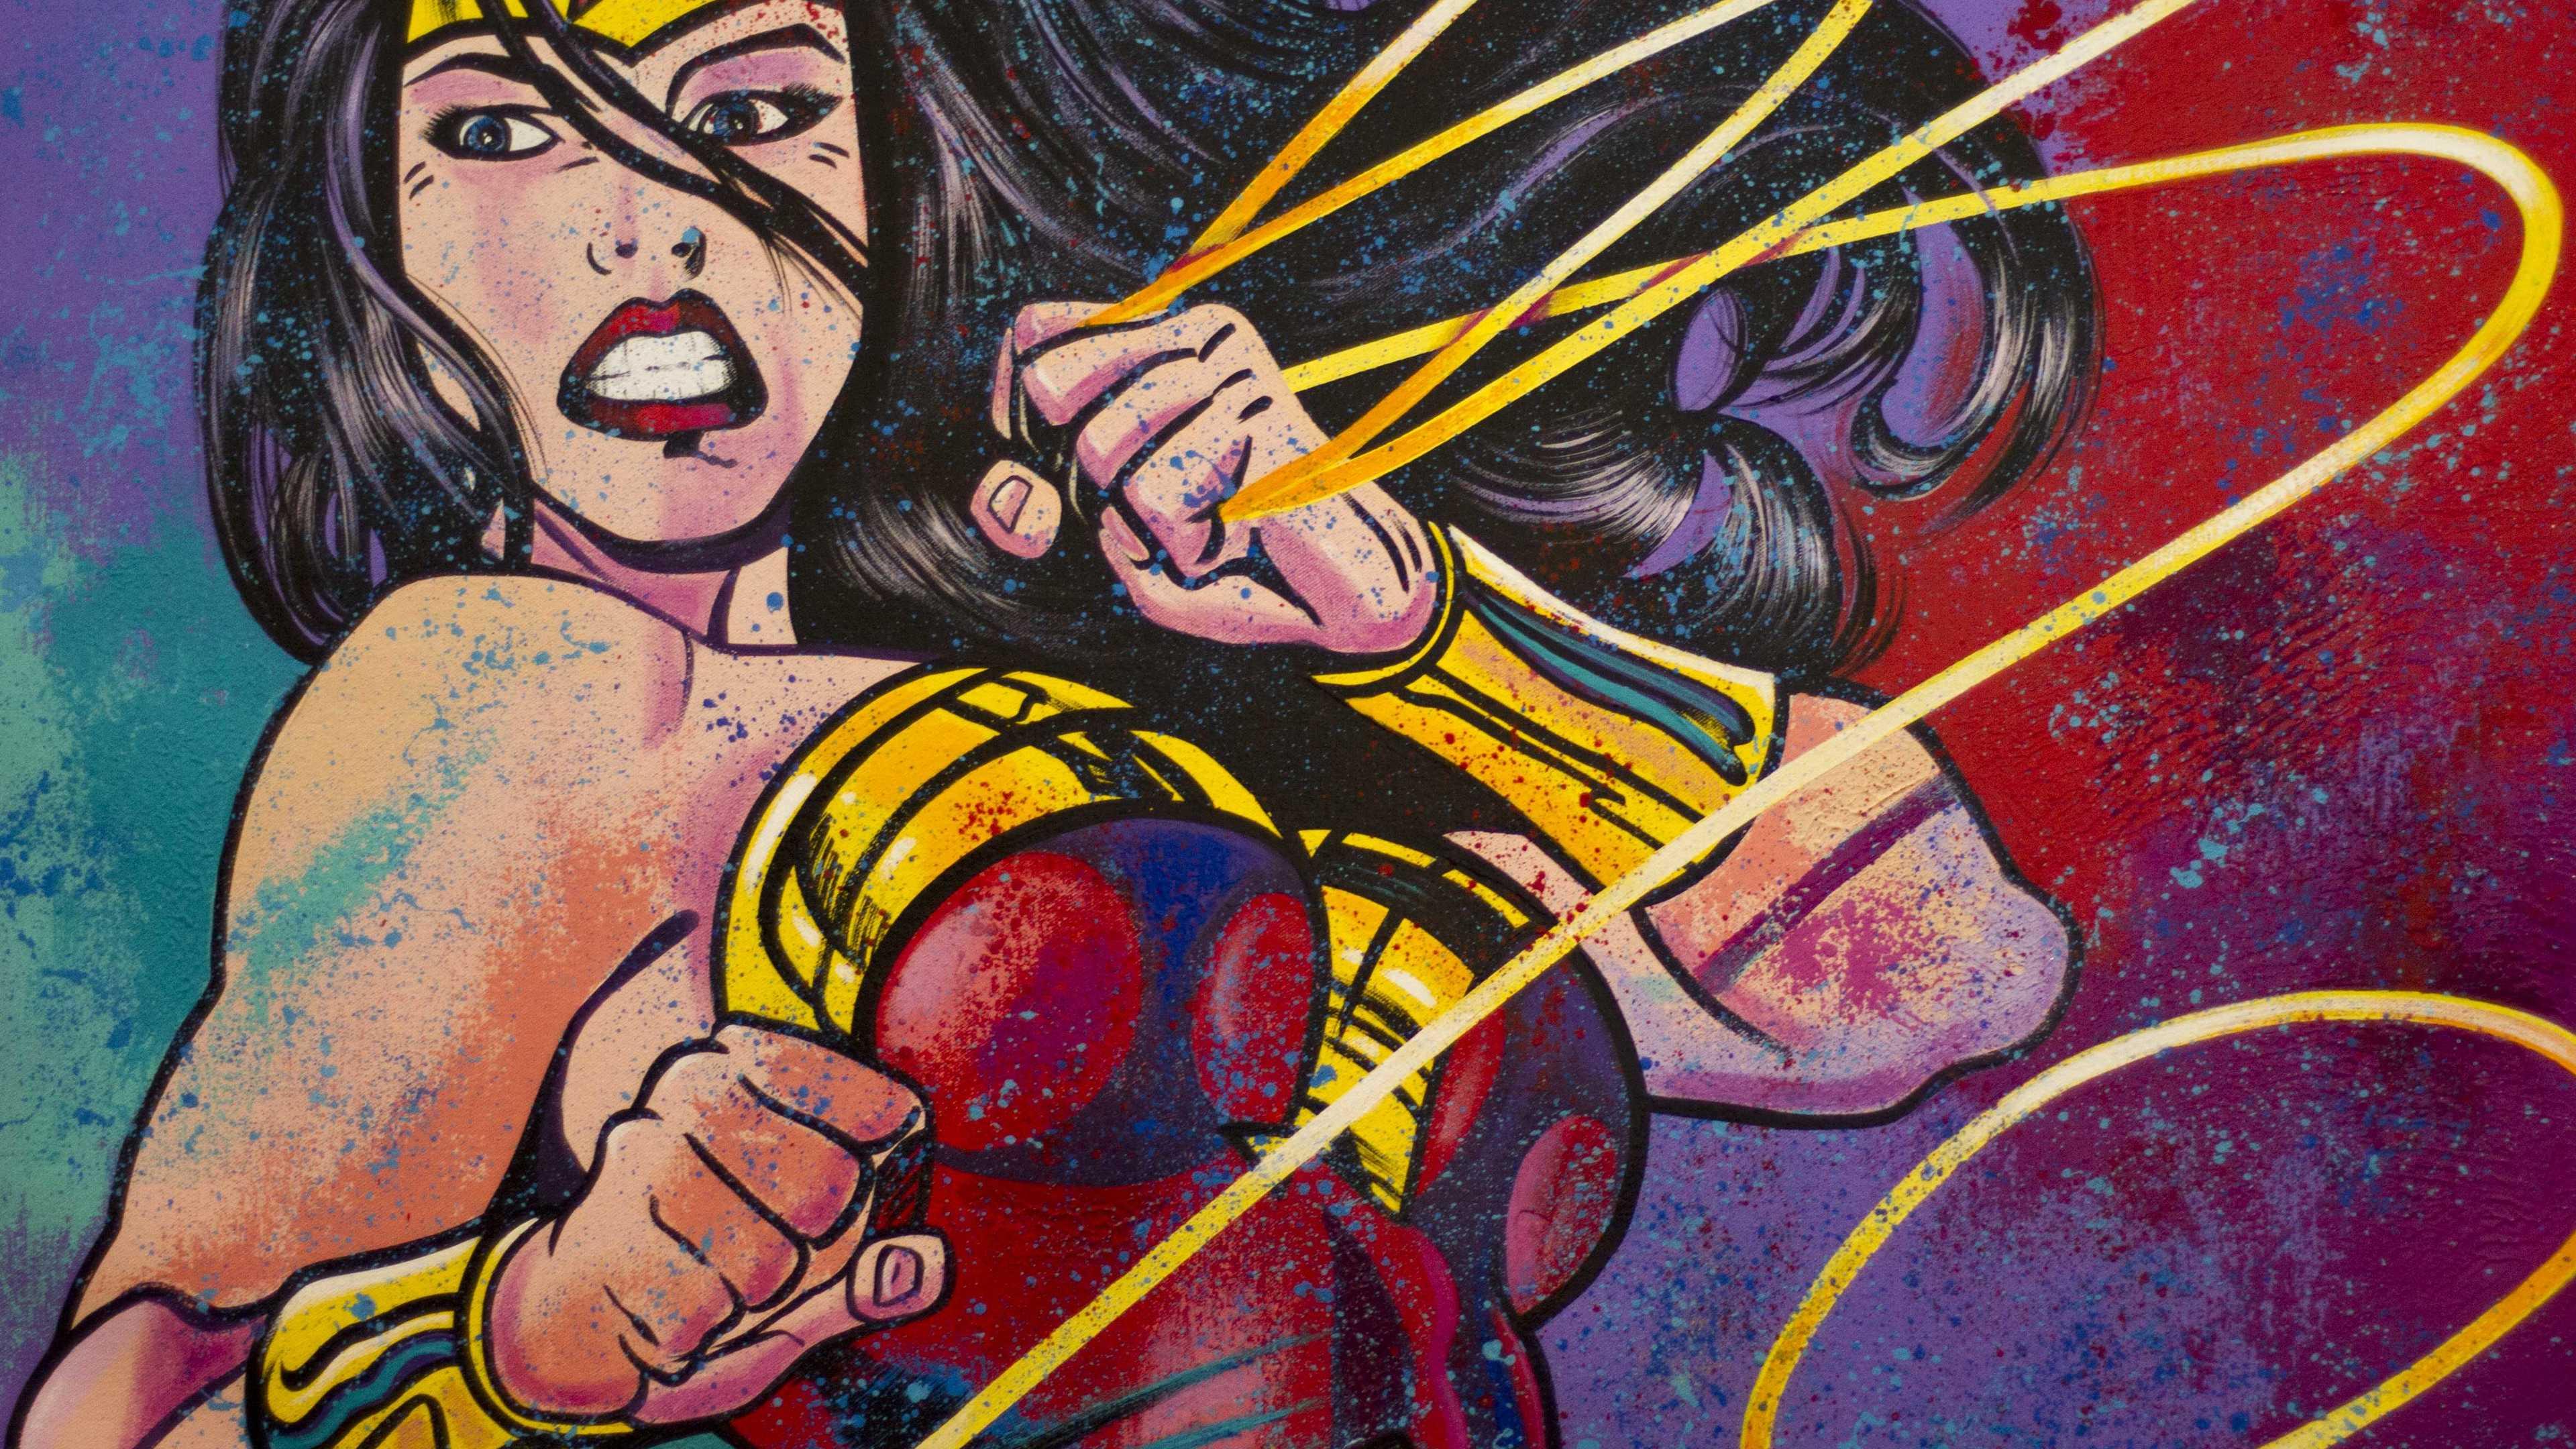 wonder woman painting arts 4k 1547319673 - Wonder Woman Painting Arts 4k - wonder woman wallpapers, superheroes wallpapers, painting wallpapers, hd-wallpapers, 4k-wallpapers